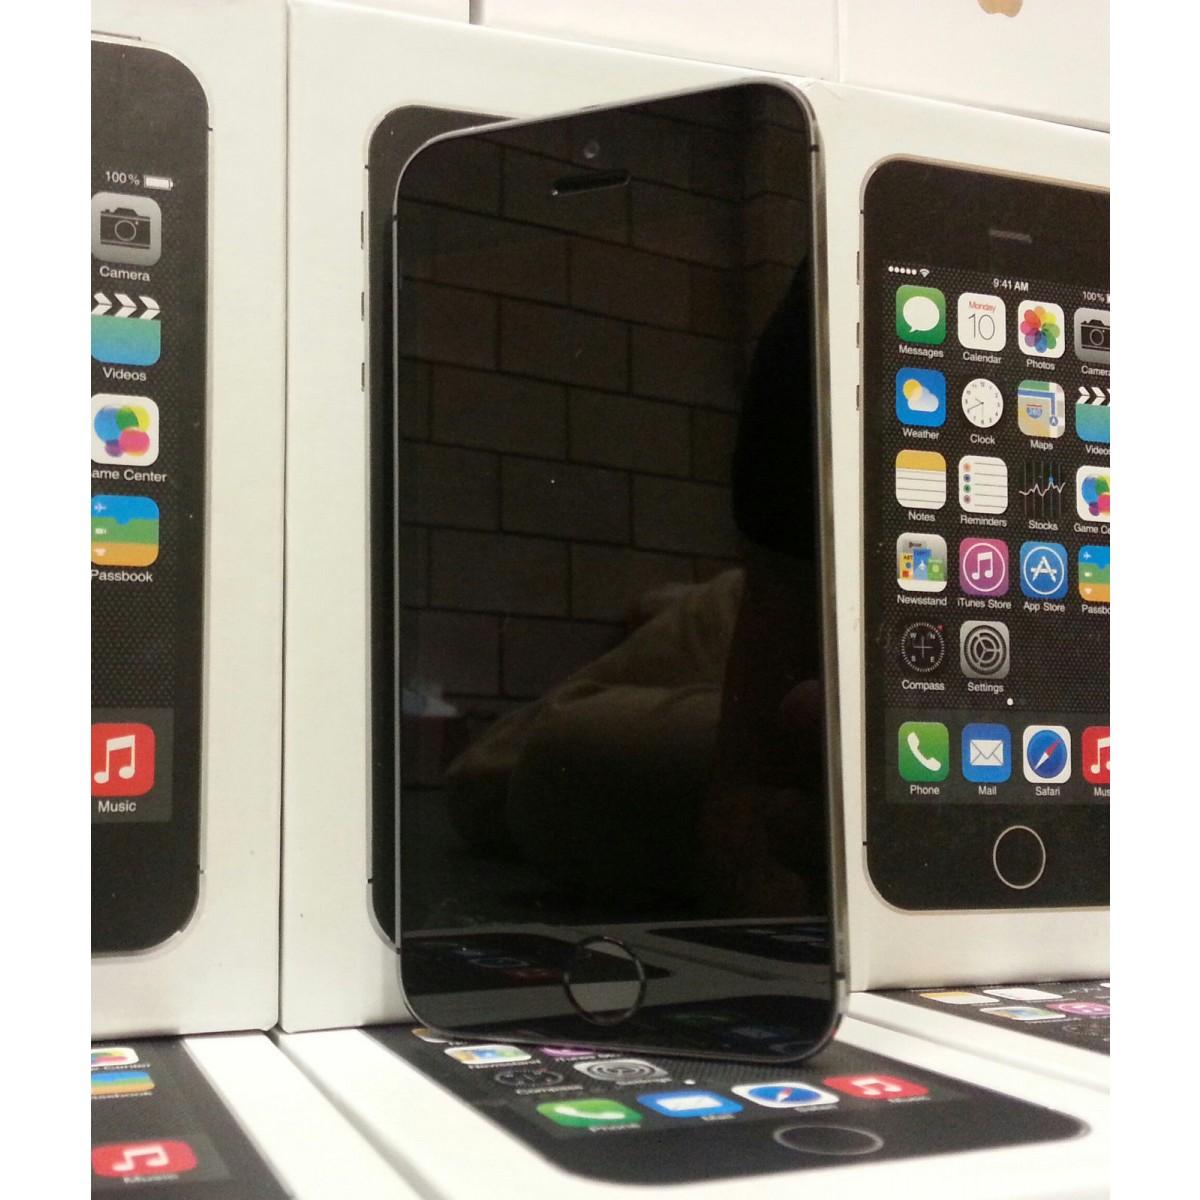 Apple Iphone 5s Latest Model 16 Gb Space Grey Unlocked Se